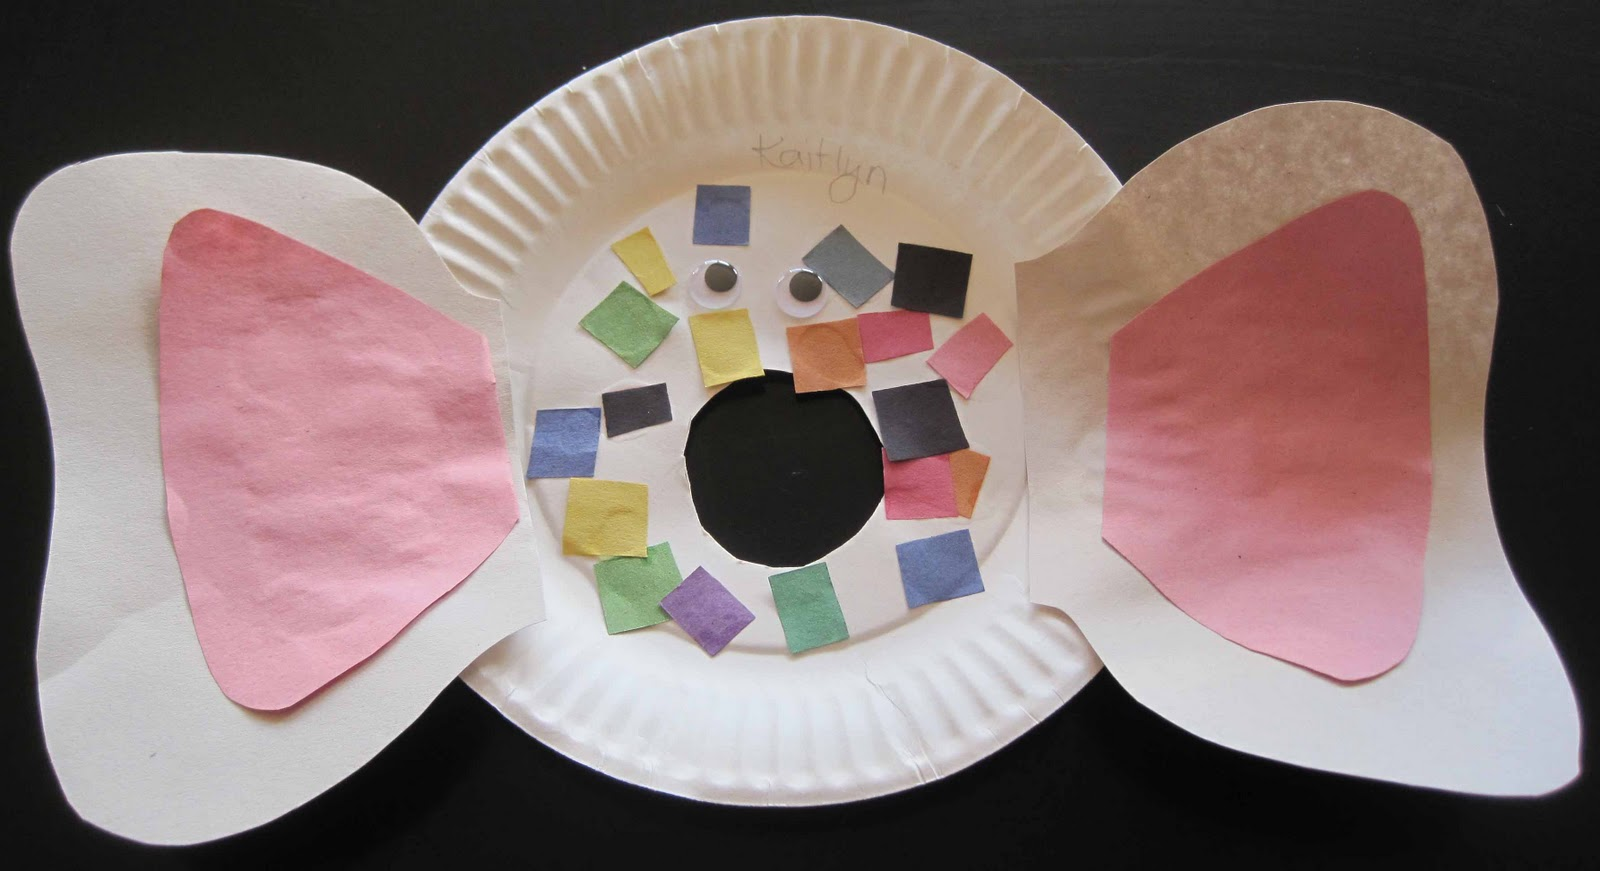 Paper Plate Elephant & Childrenu0027s Learning Activities: Paper Plate Elephant